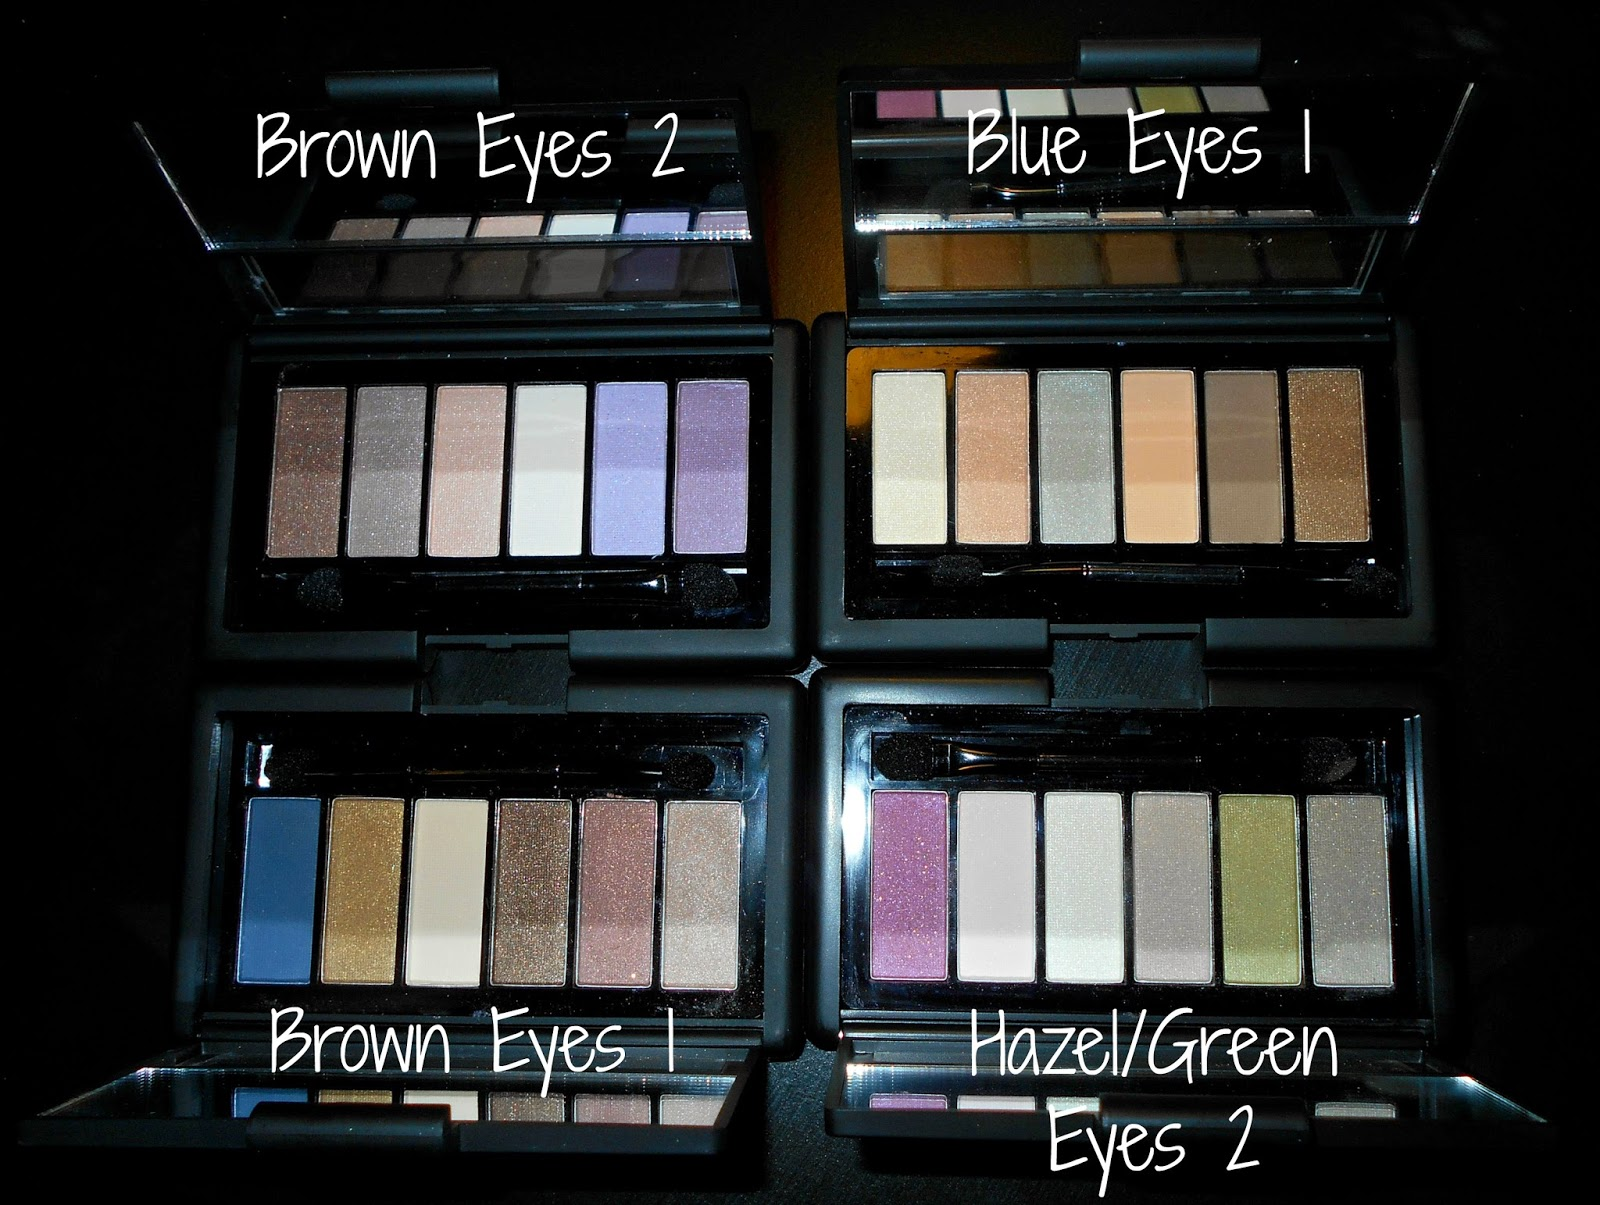 ELF Studio Eye Enhancing Eyeshadow Palettes